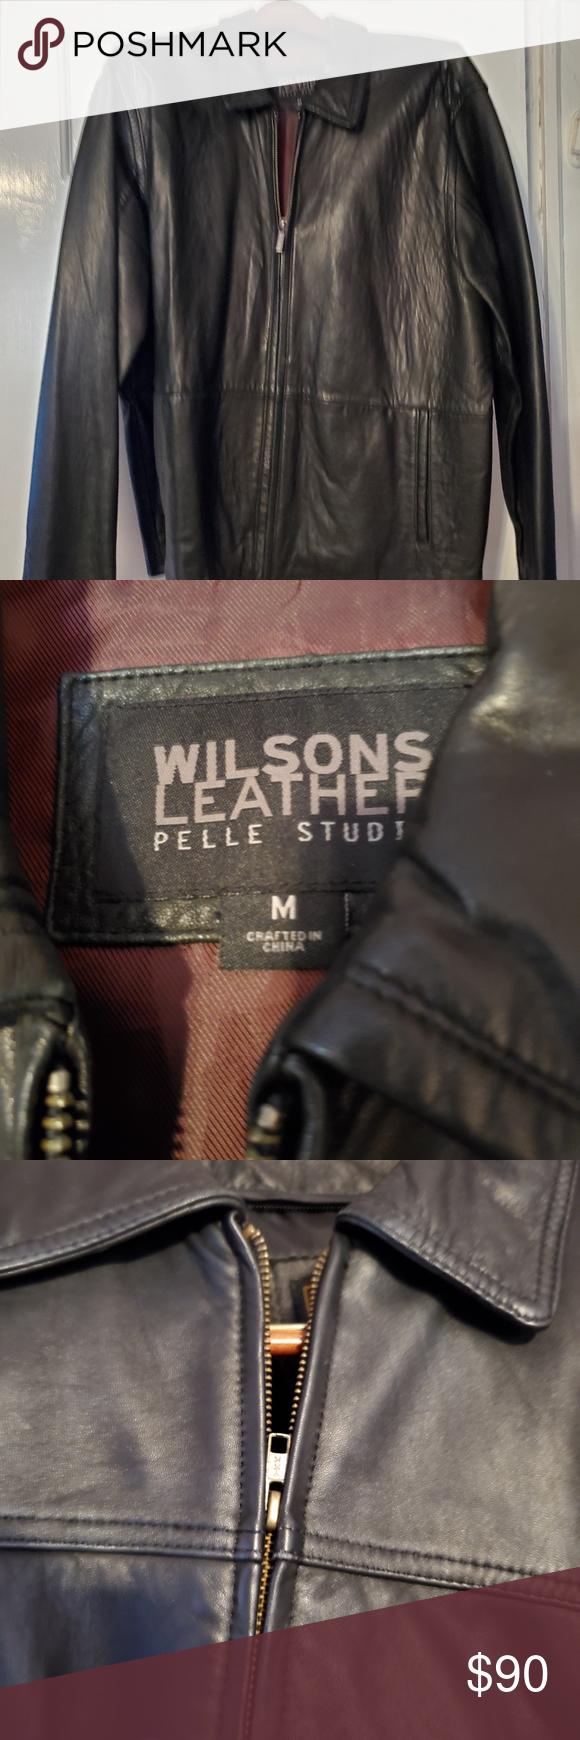 Wilson Leather Pelle Studio Men's M Leather Jacket Wilson